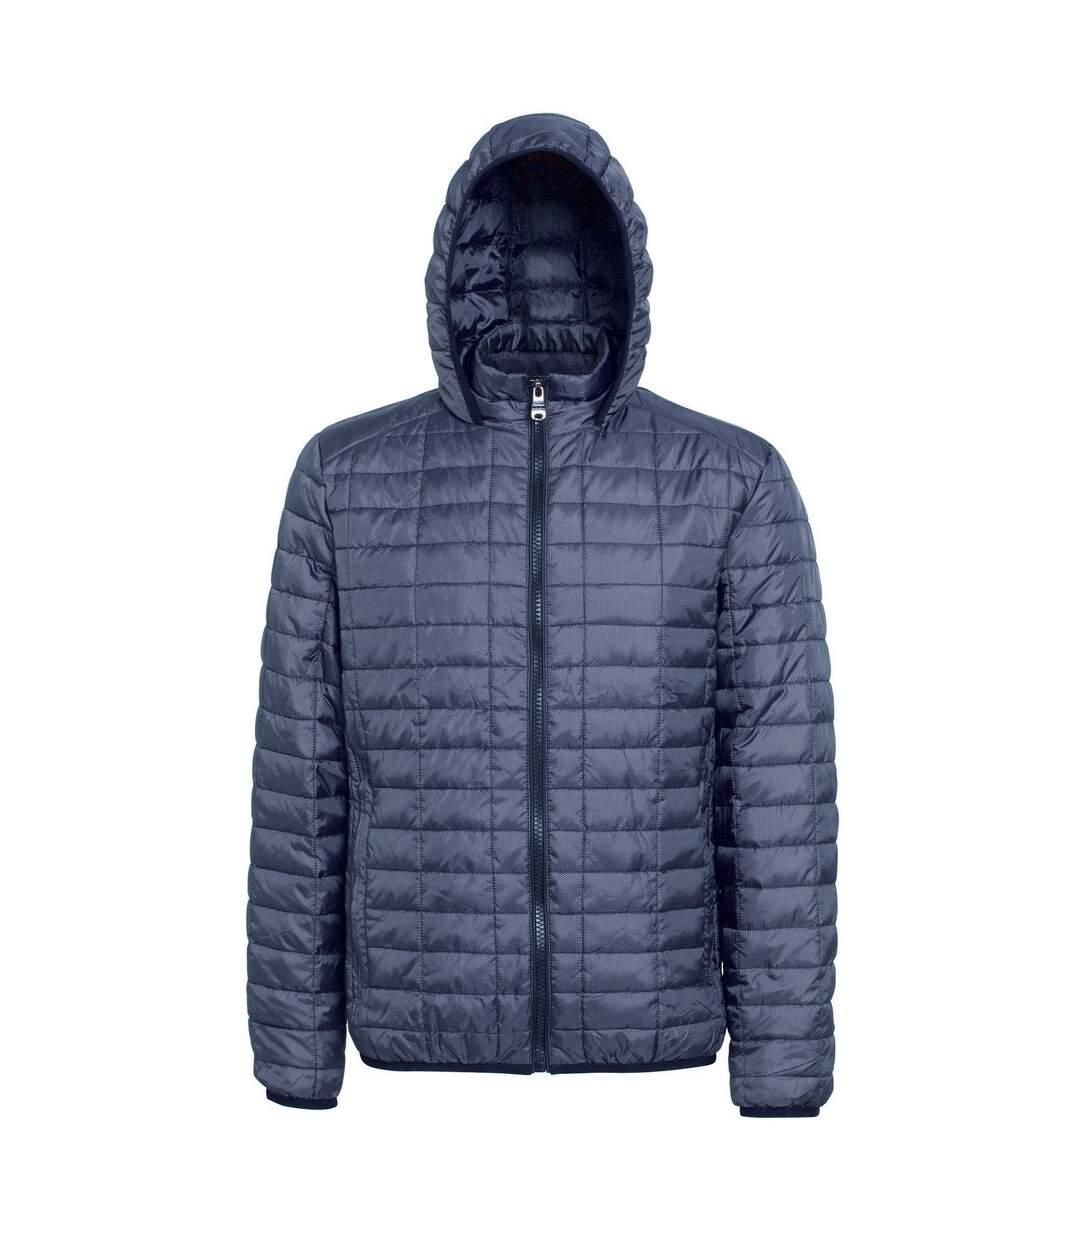 2786 Mens Honeycomb Padded Hooded Jacket (Black) - UTRW5018